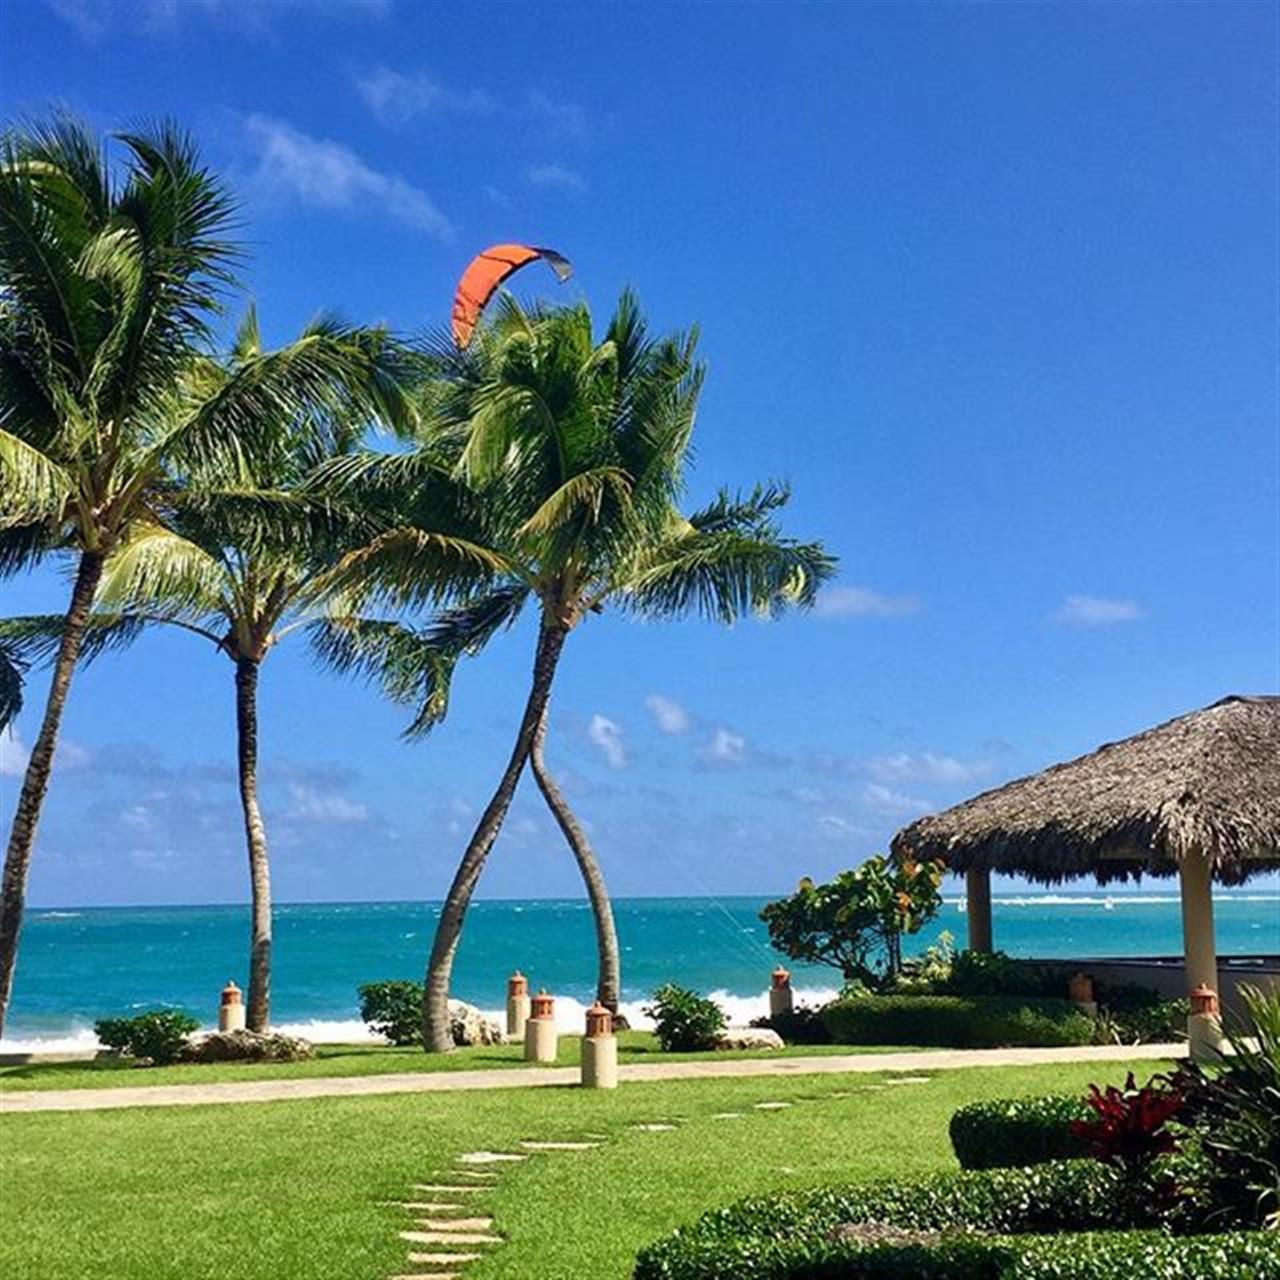 Cabarete Fun! ??#Cabarete #kiteboarding  #kitesurfing #beach #sun #bluesky #caribbeanlife #selectcaribbean #leadingrelocal #dr